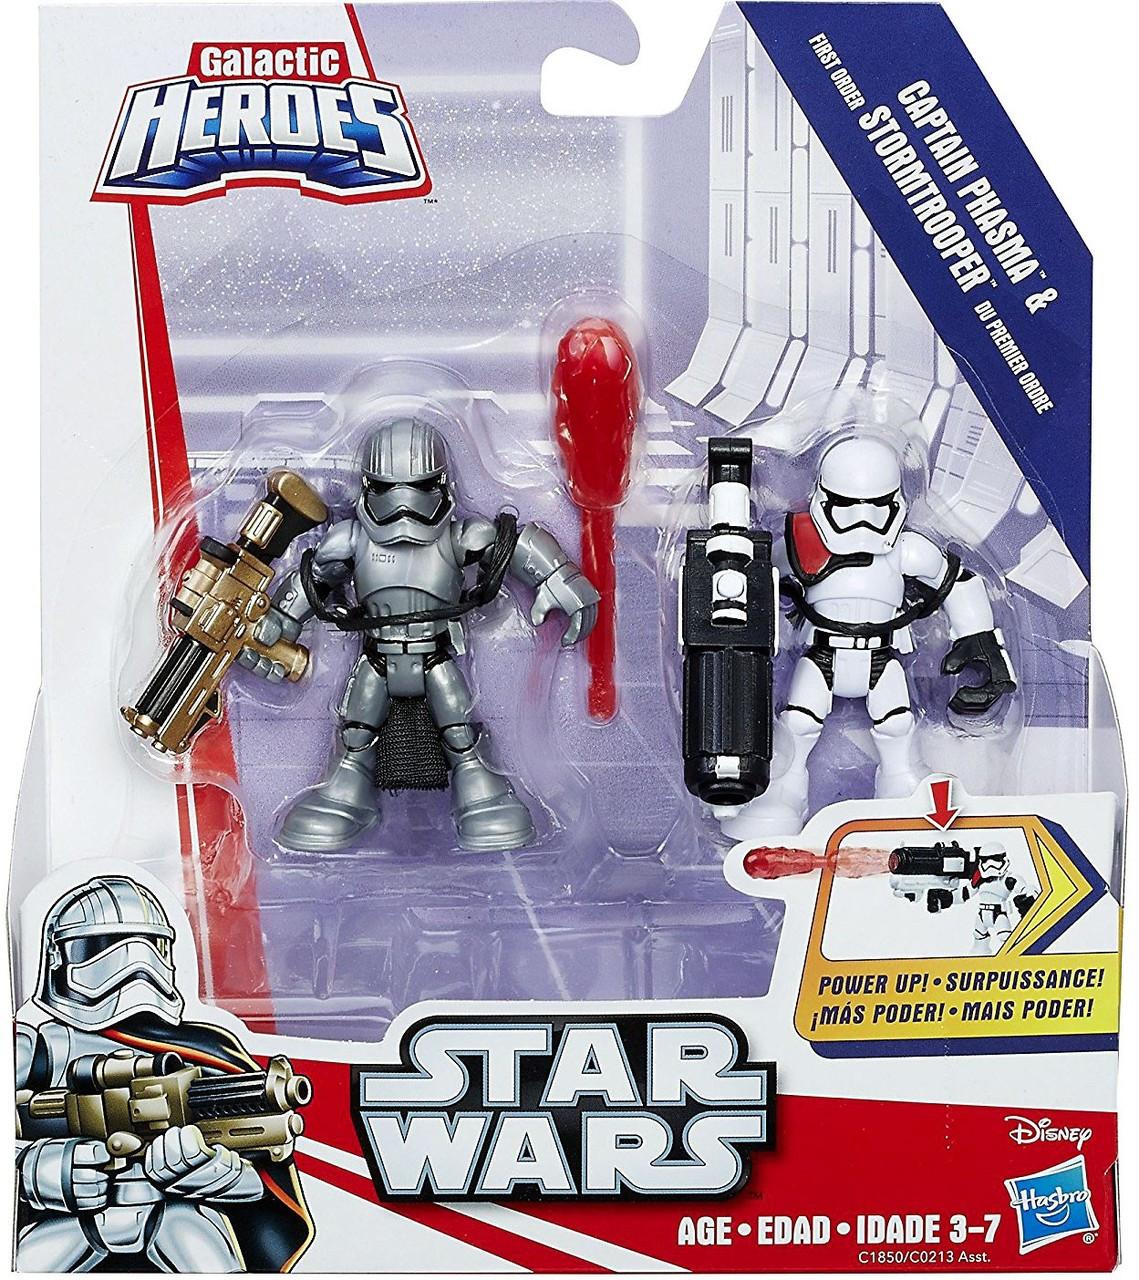 Galactic Heroes Star Wars SANDTROOPER mini Figure jedi force stormtrooper